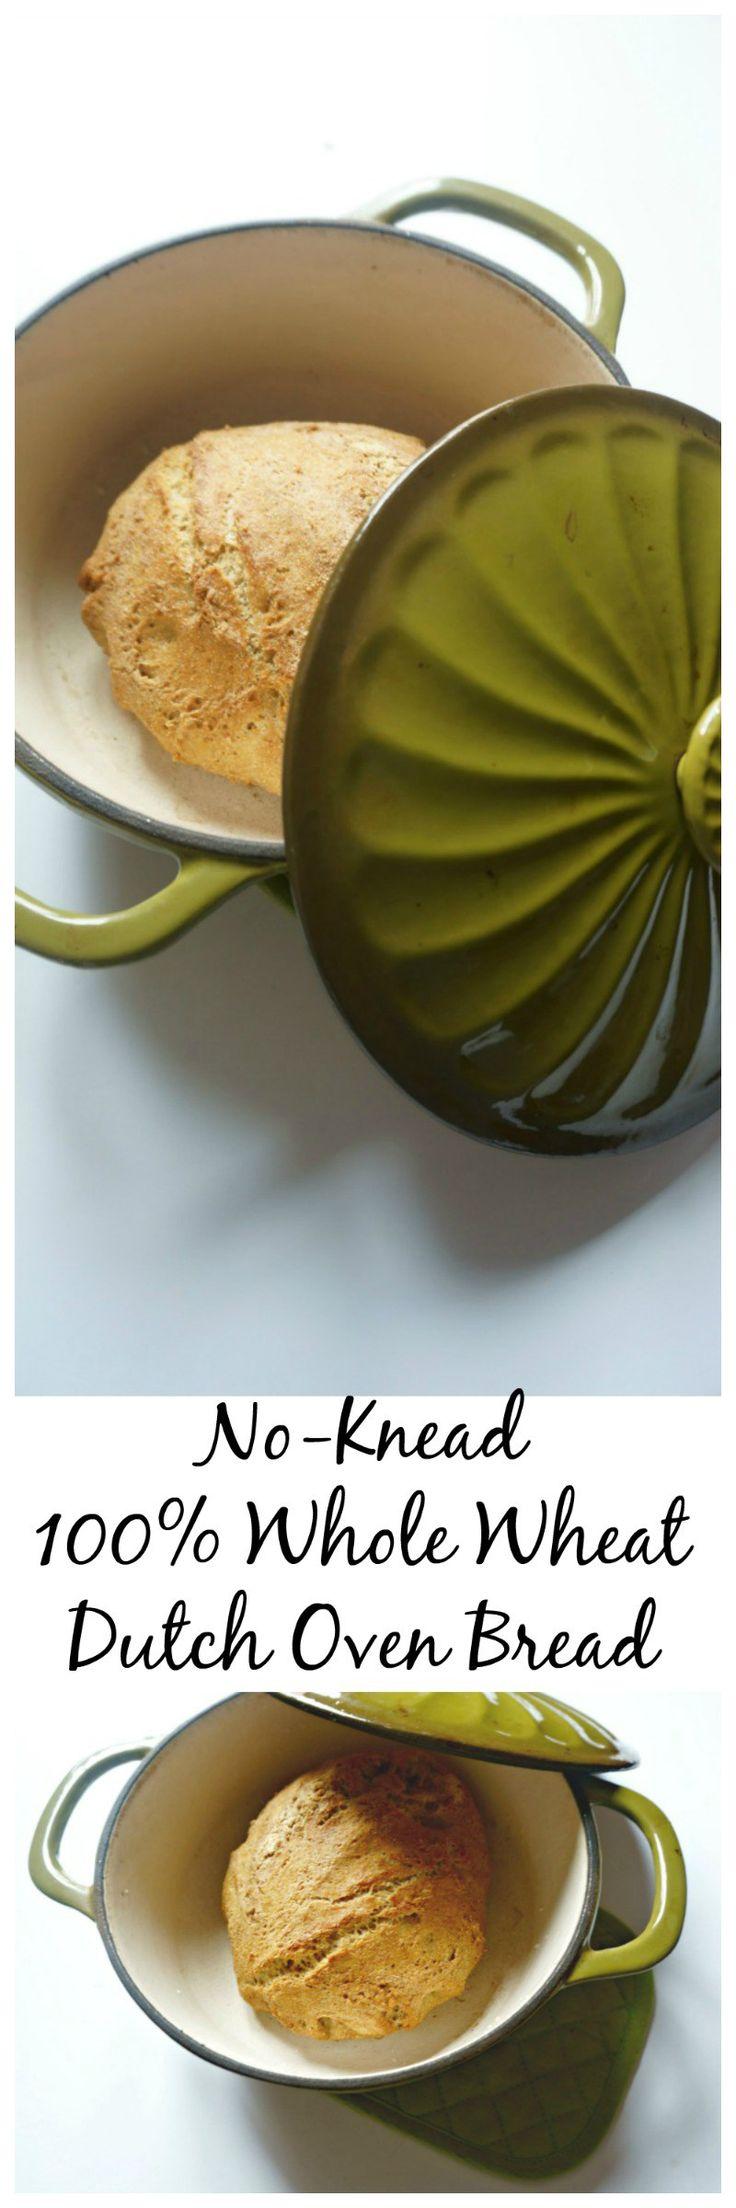 "NoKnead Whole Wheat Dutch Oven Bread A Mind ""Full"" Mom"